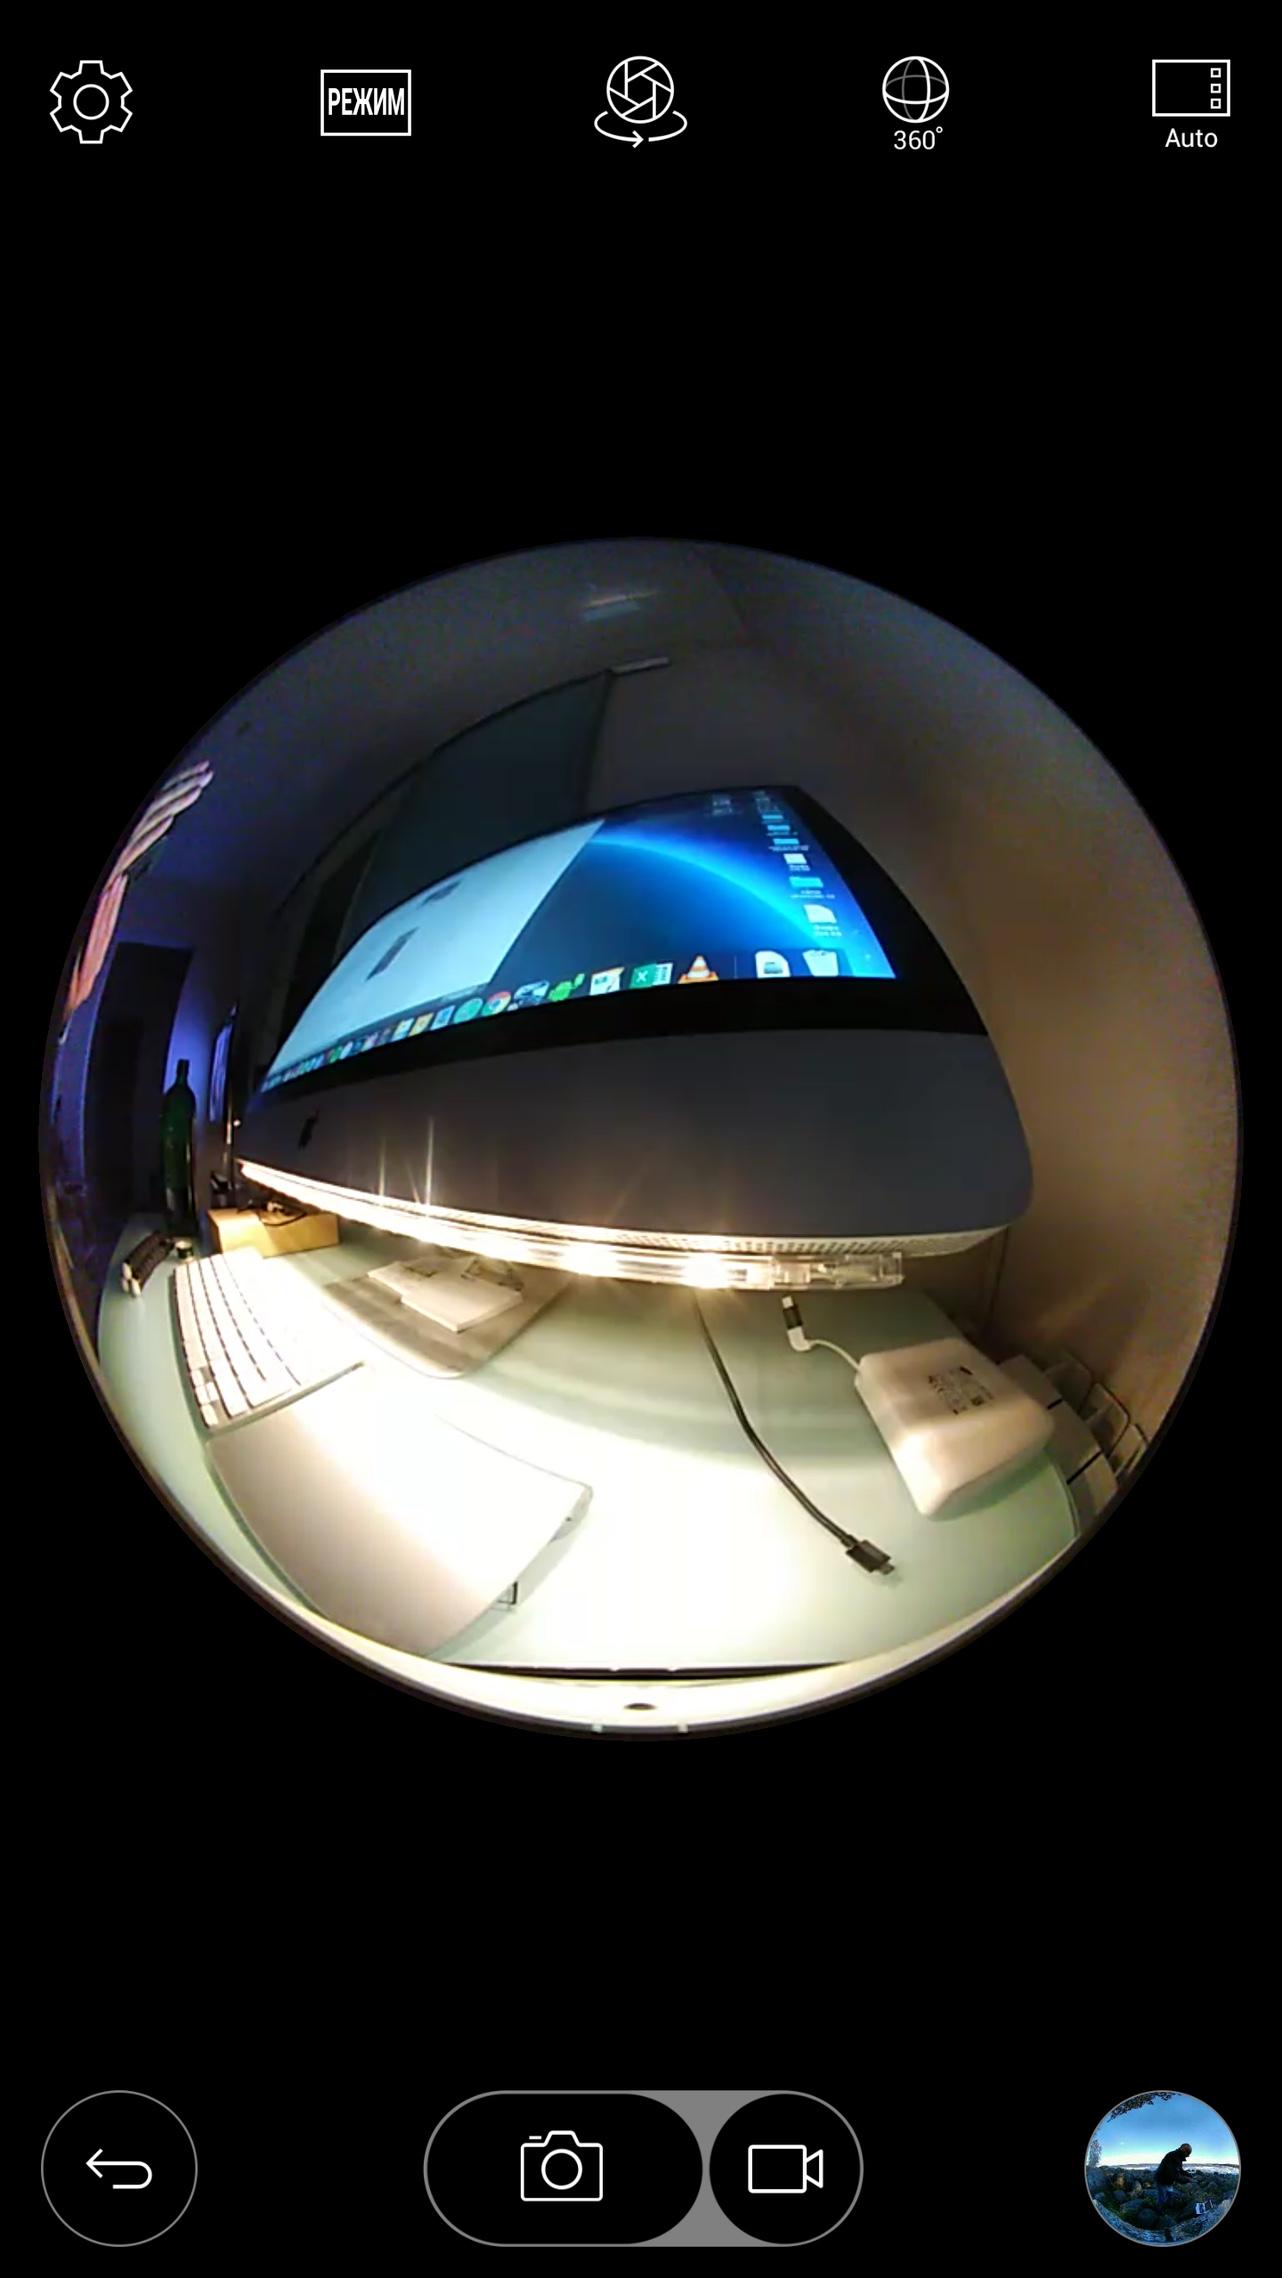 LG 360 cam manager